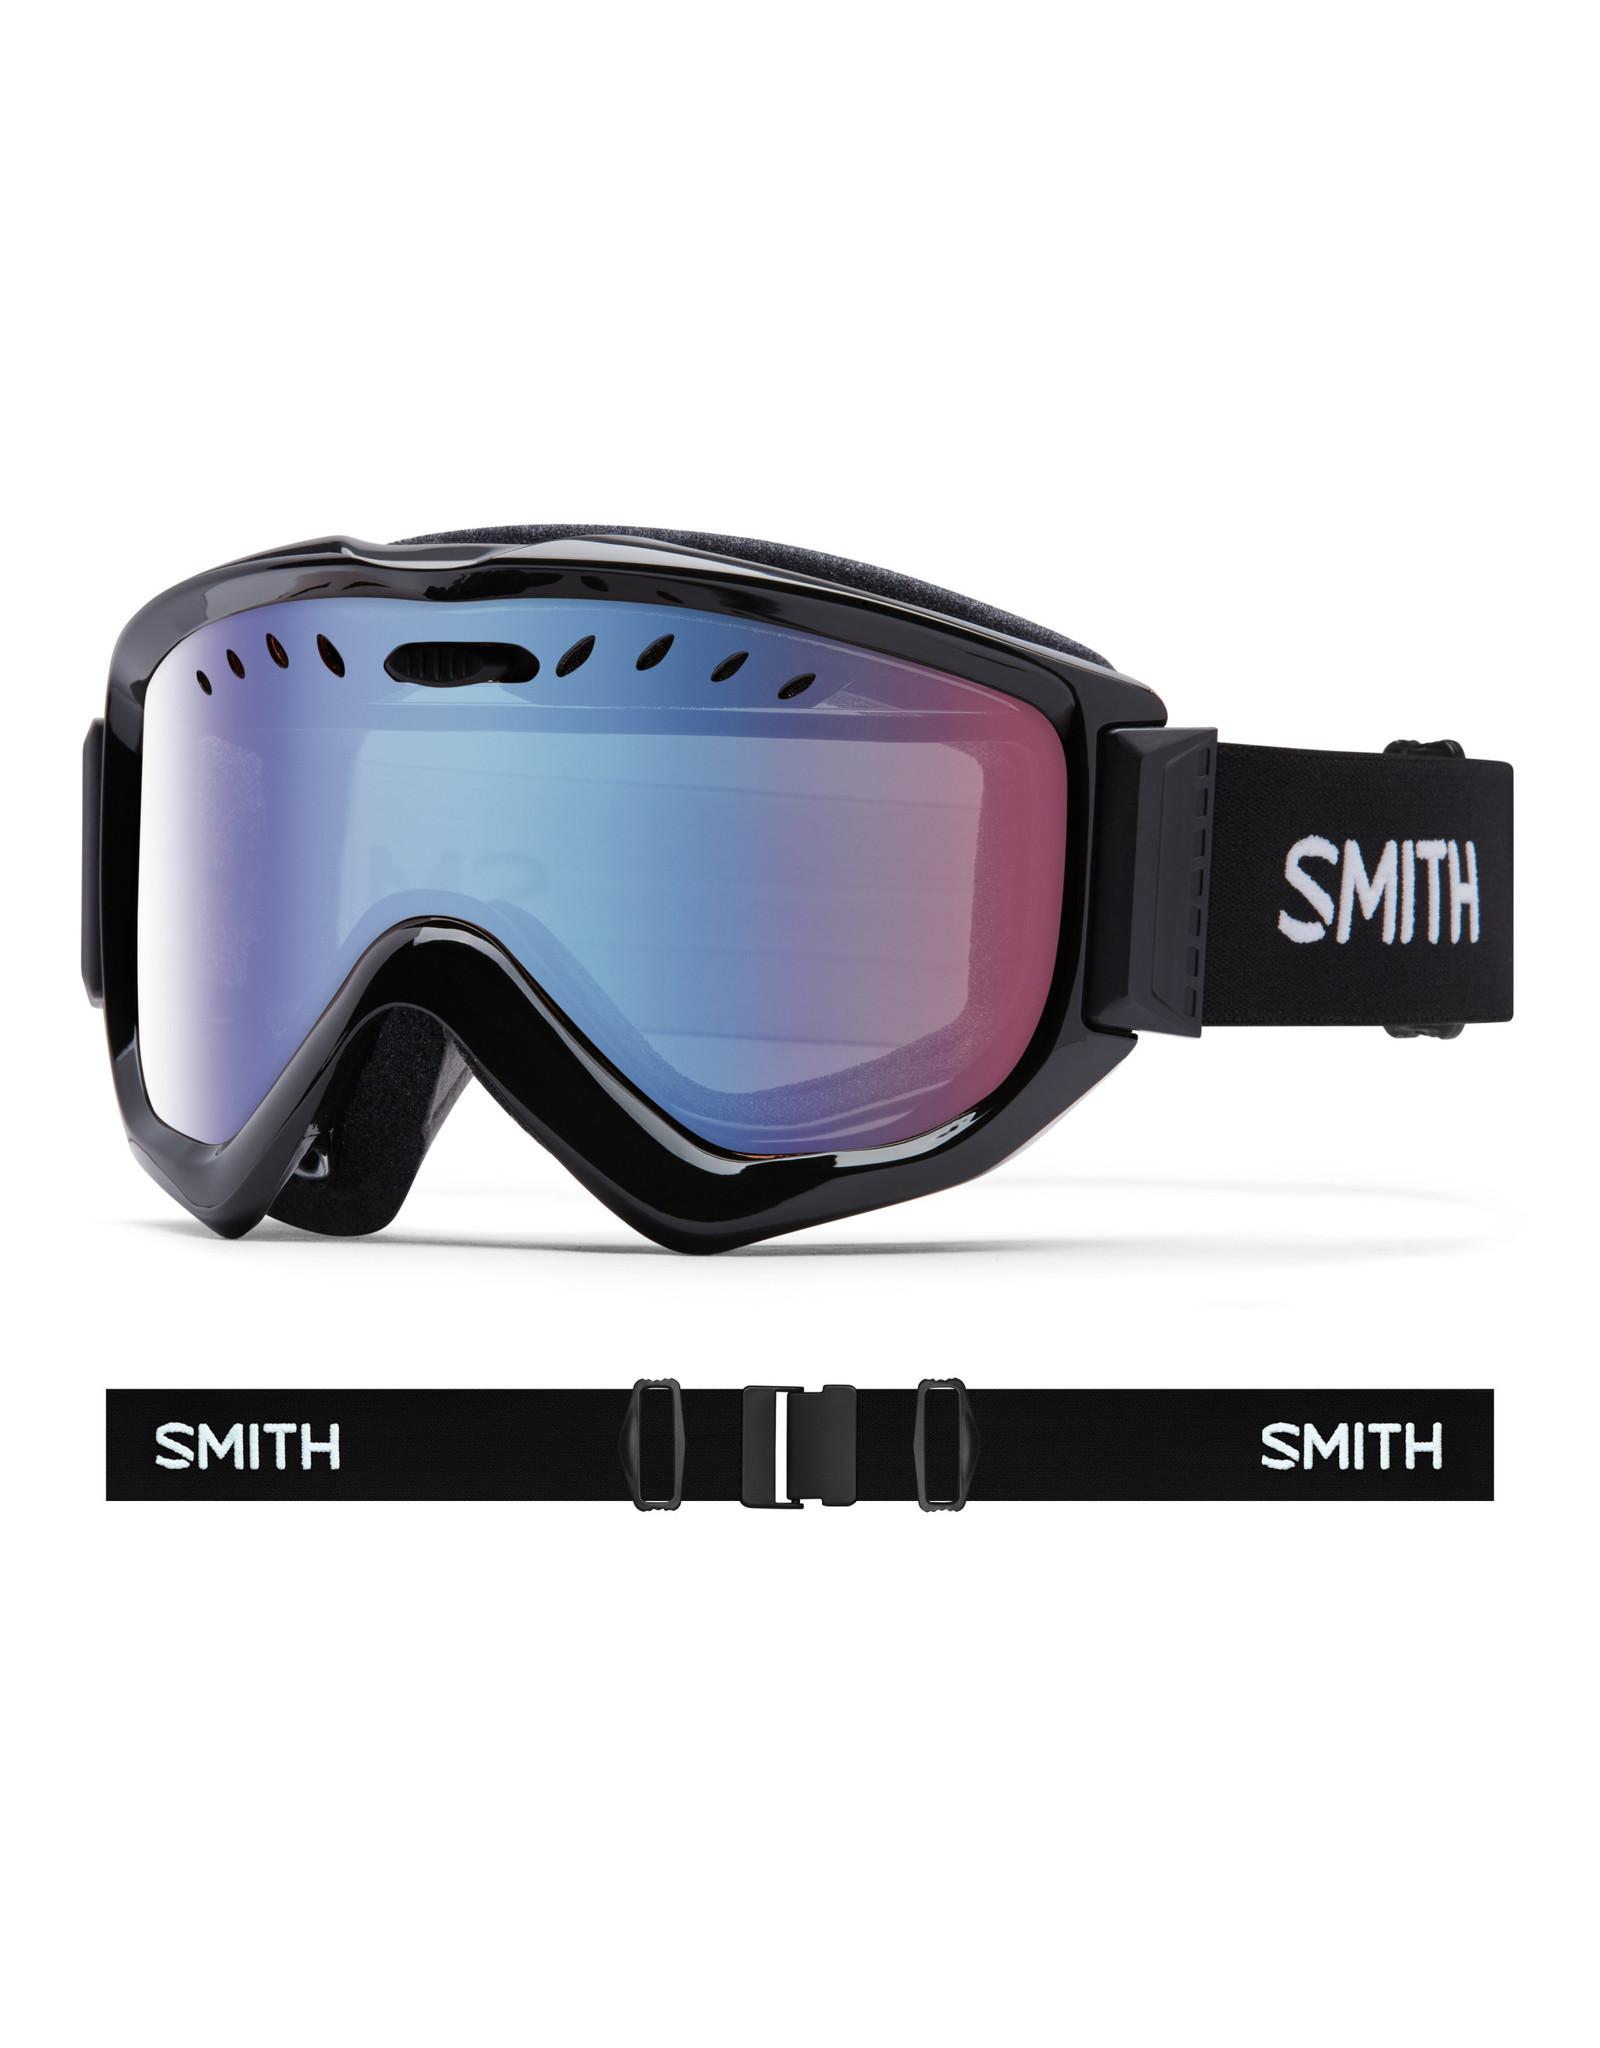 Smith SMITH KNOWLEDGE OTG BLACK 20 SKI GOGGLE